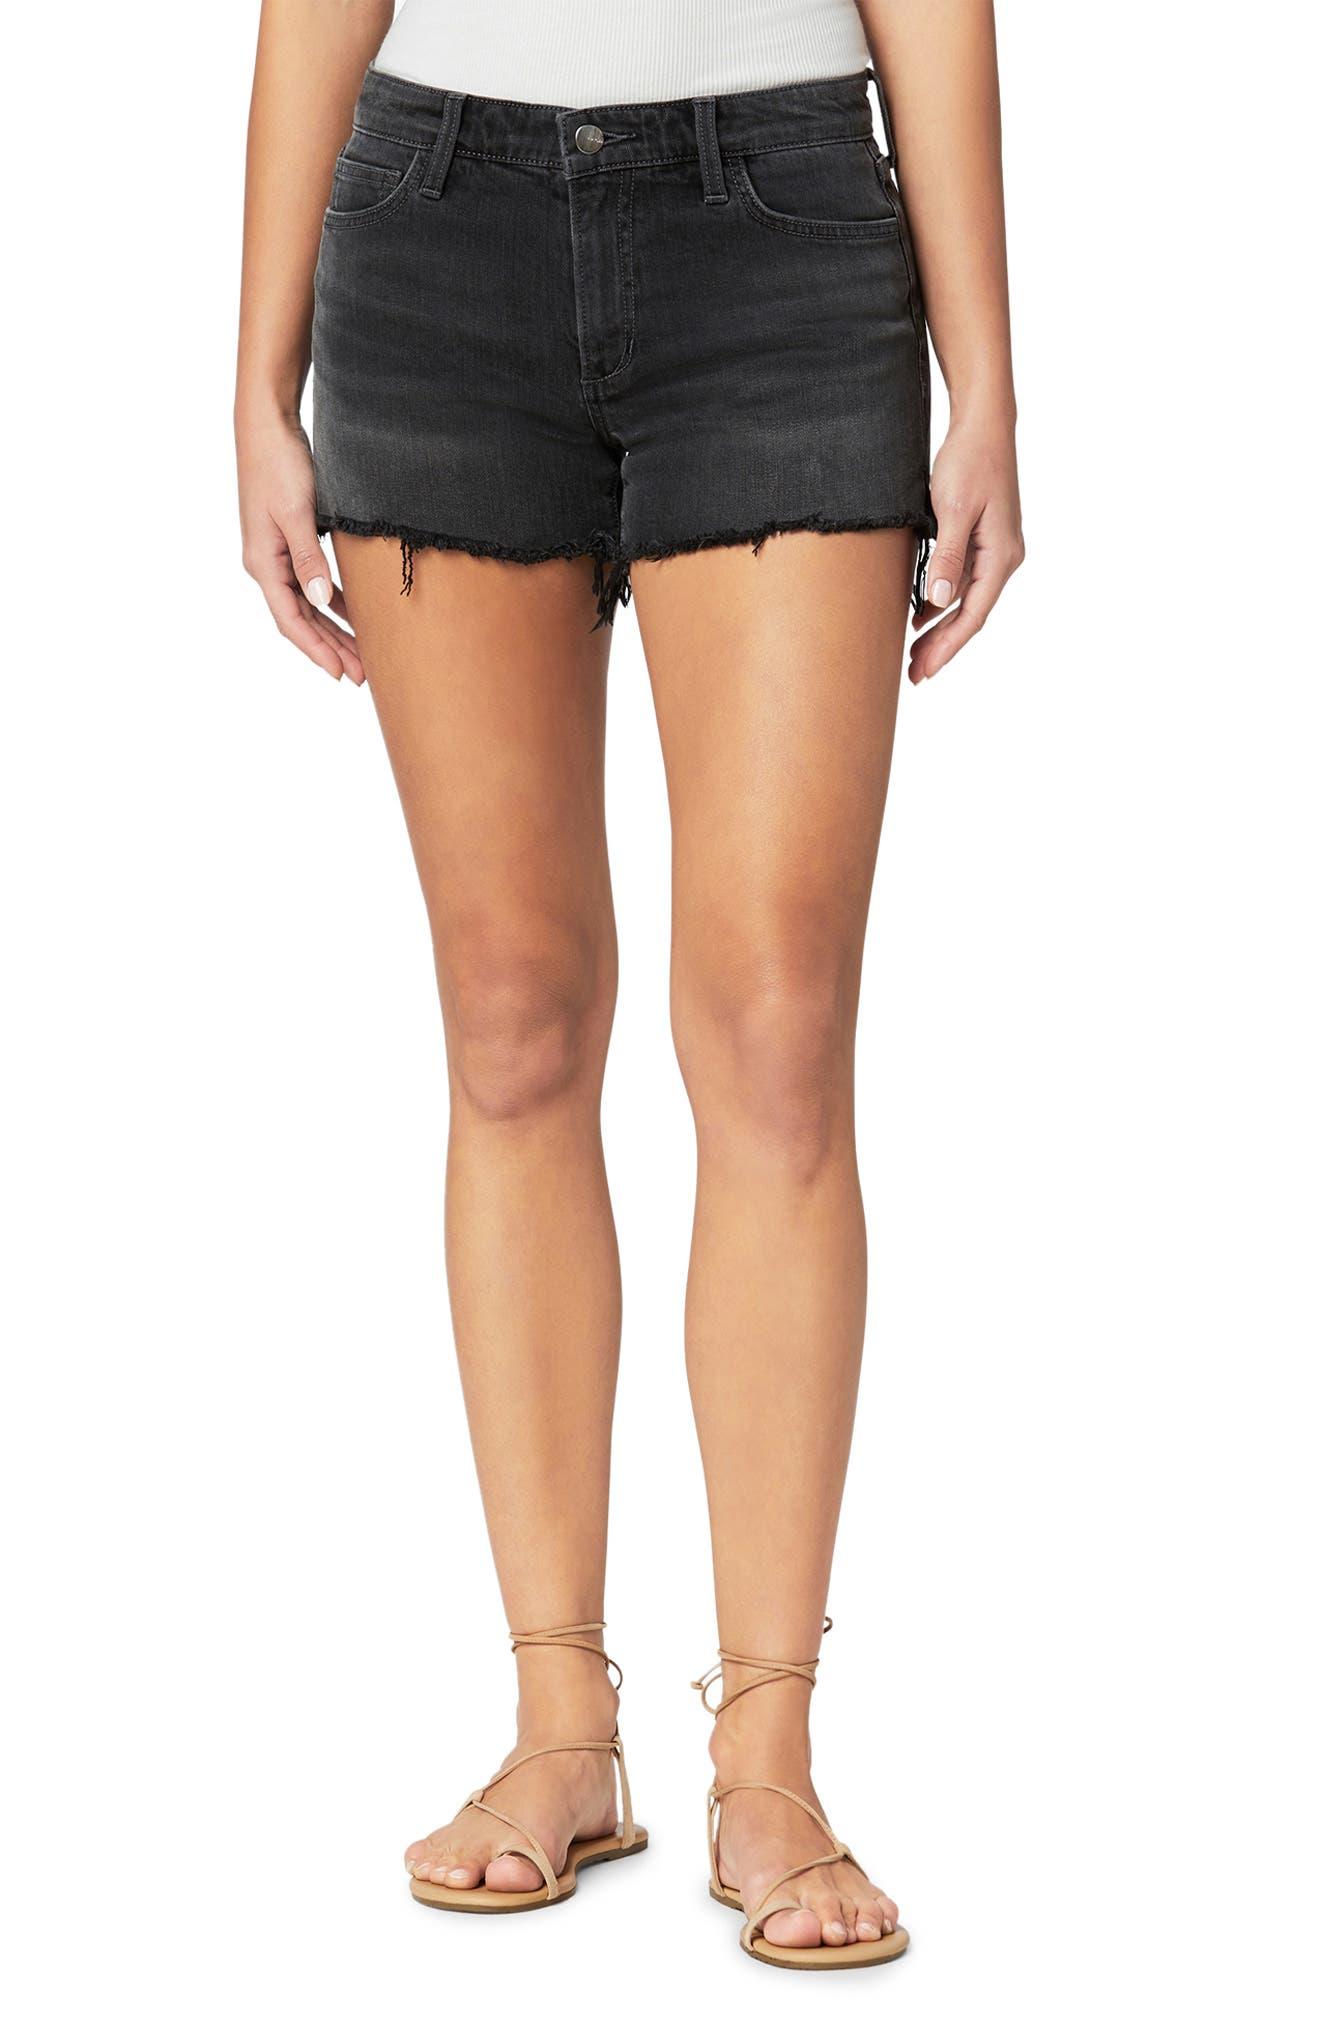 The Ozzie Frayed Hem Denim Shorts